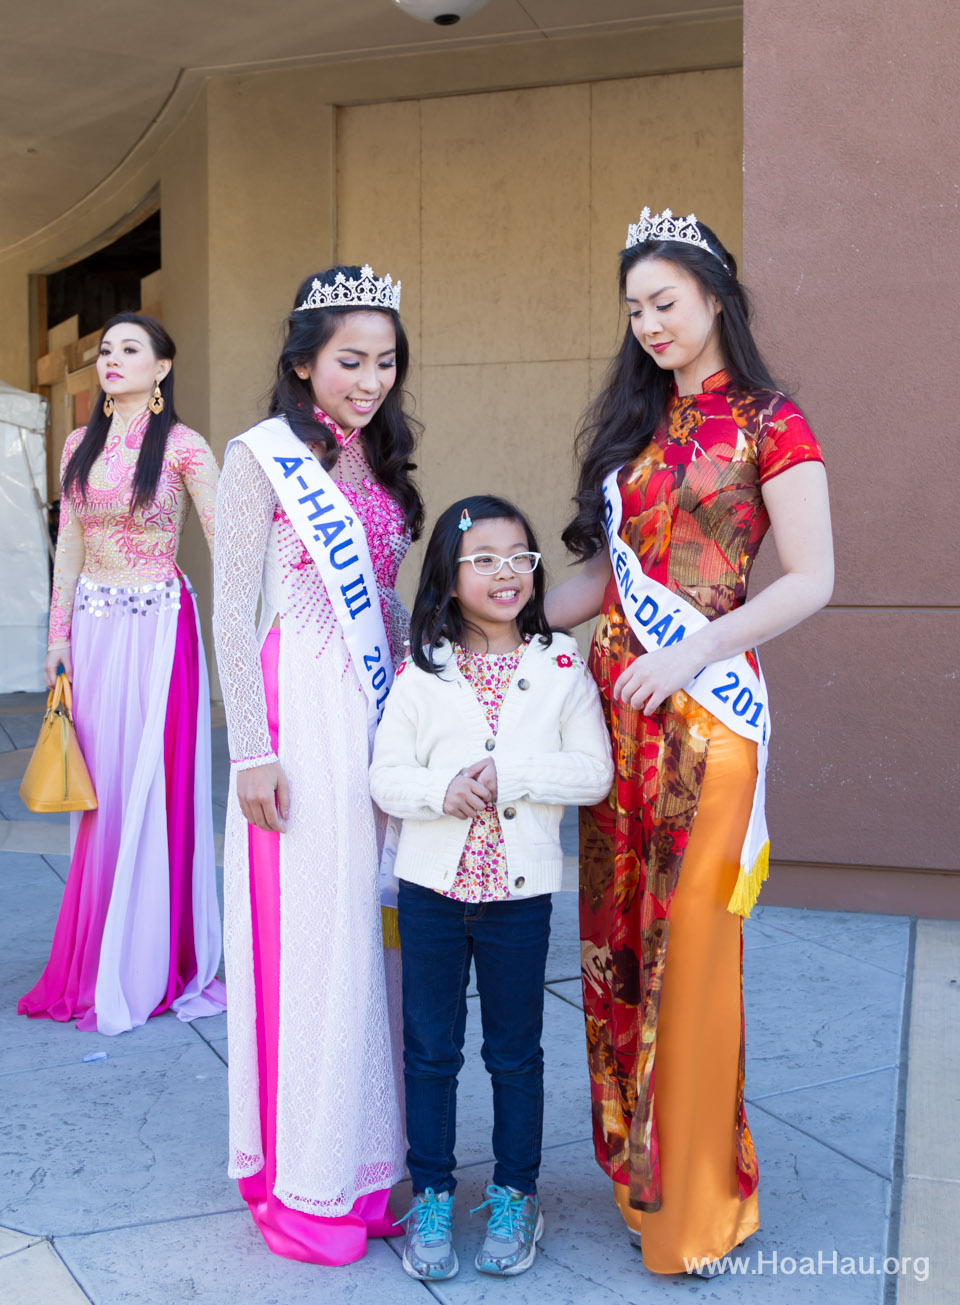 Tet Festival 2014 at Vietnam Town - Hoa Hau - Miss Vietnam - Image 136